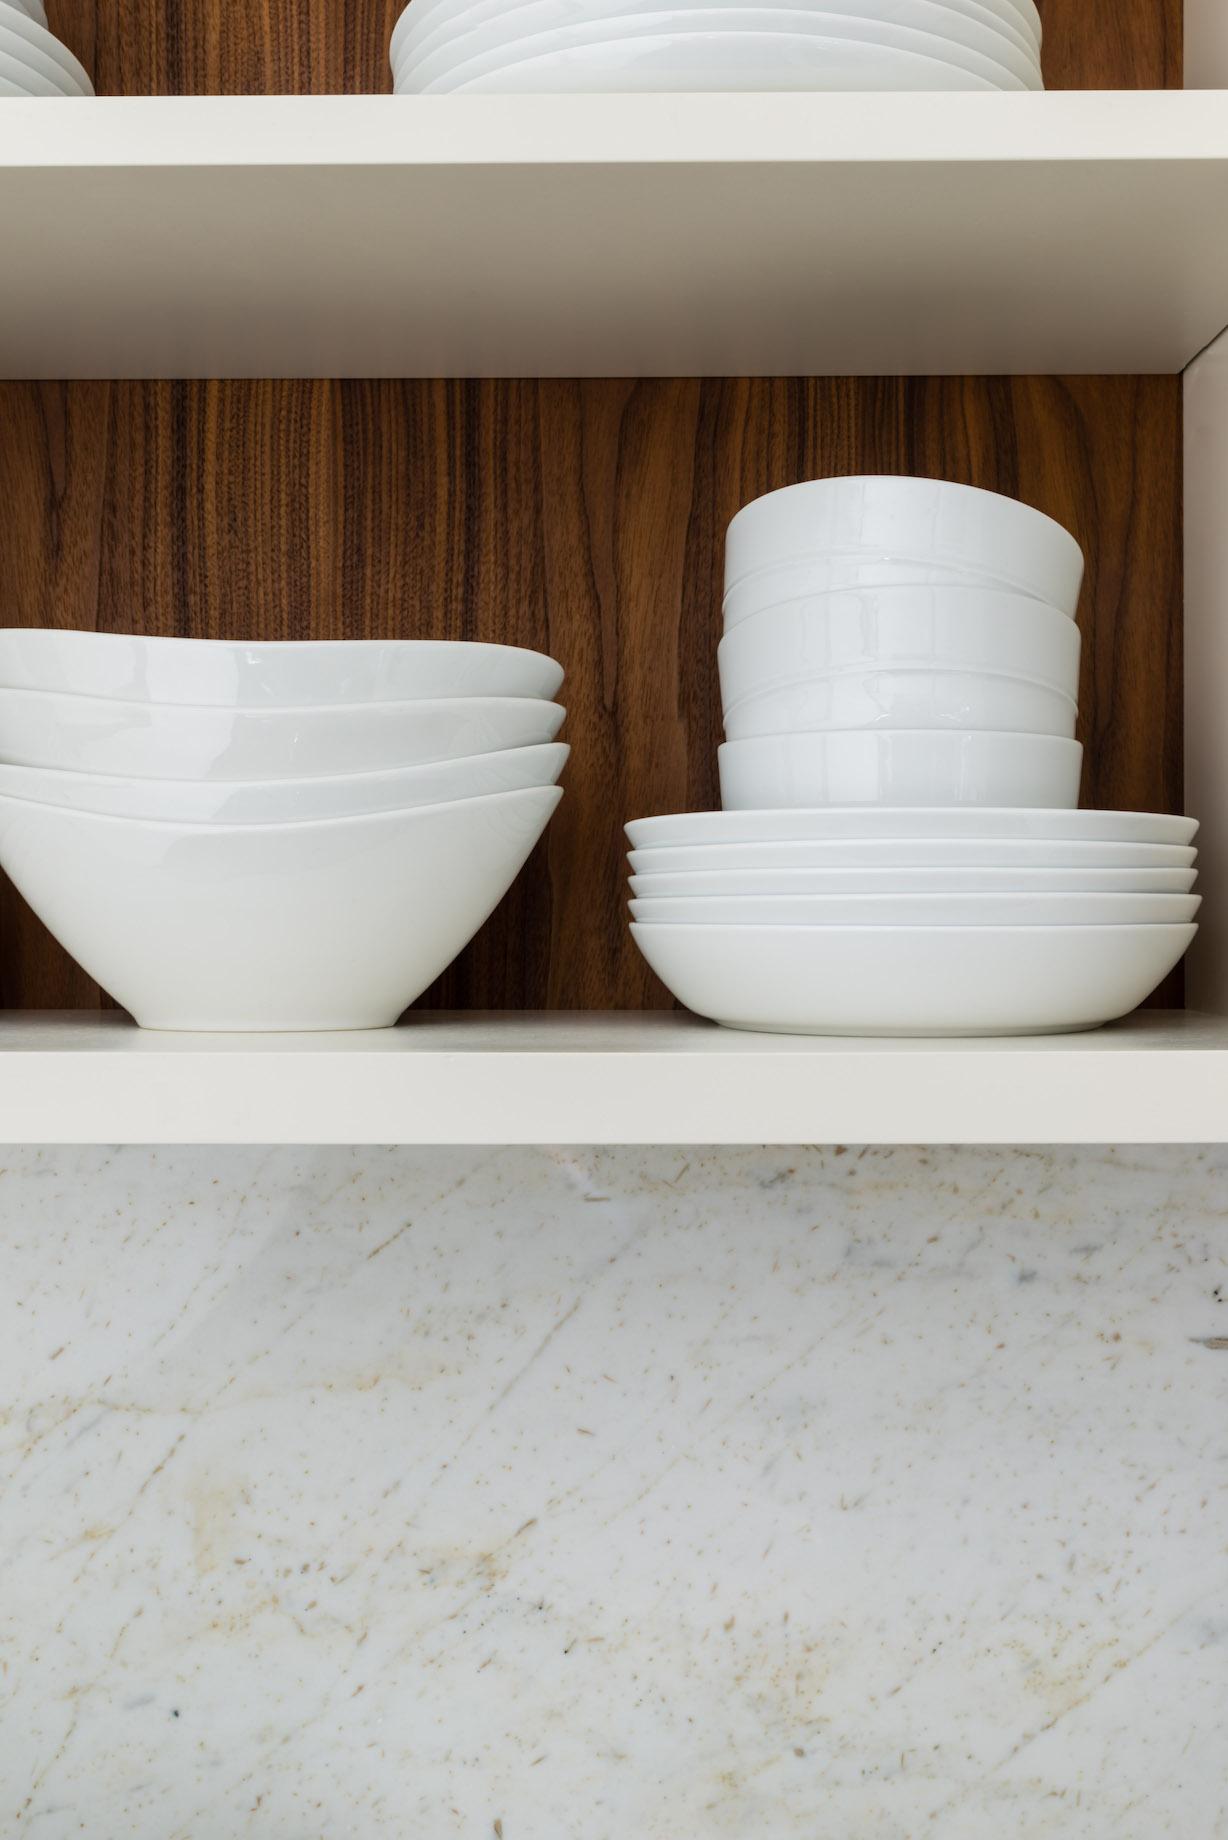 beth-bourque-design-studio-custom-kitchen-design-custom-range-hood-in-wood-interior-design-milton-ma